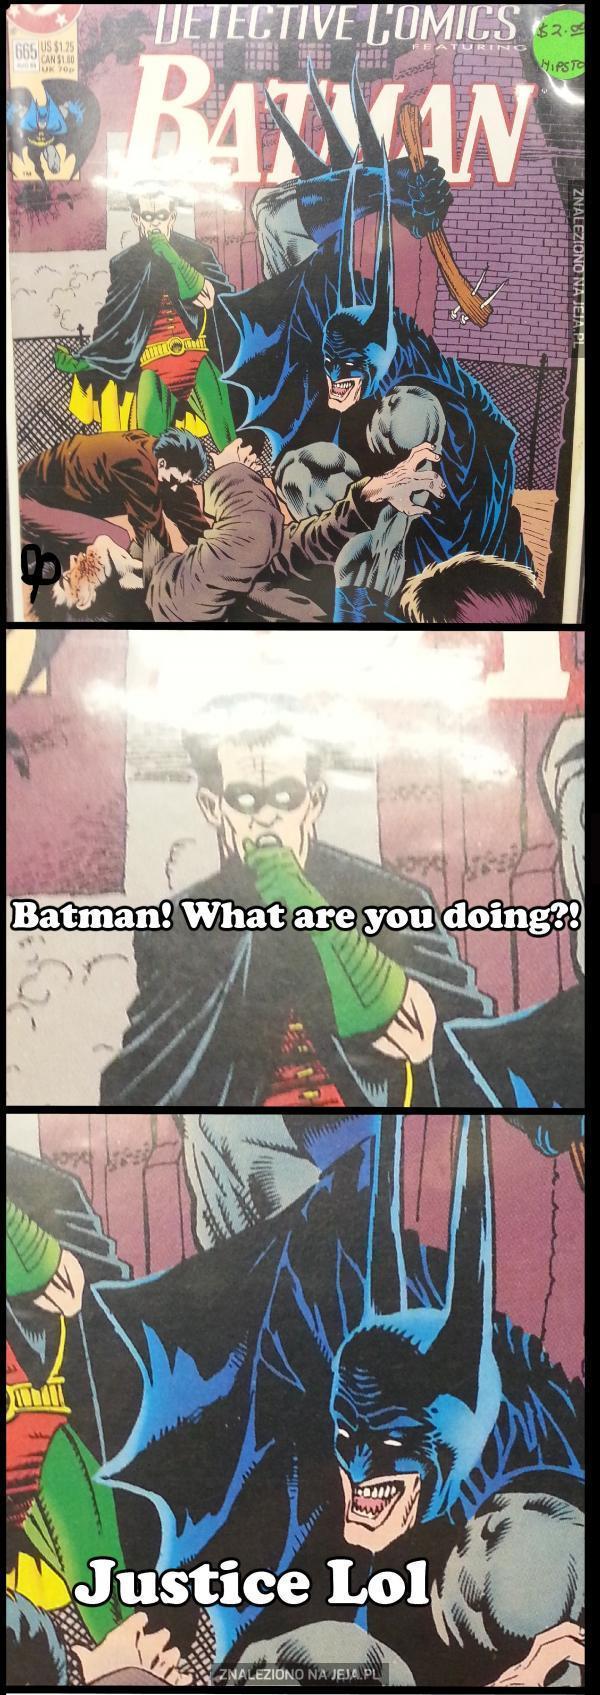 Batman, co ty robisz?